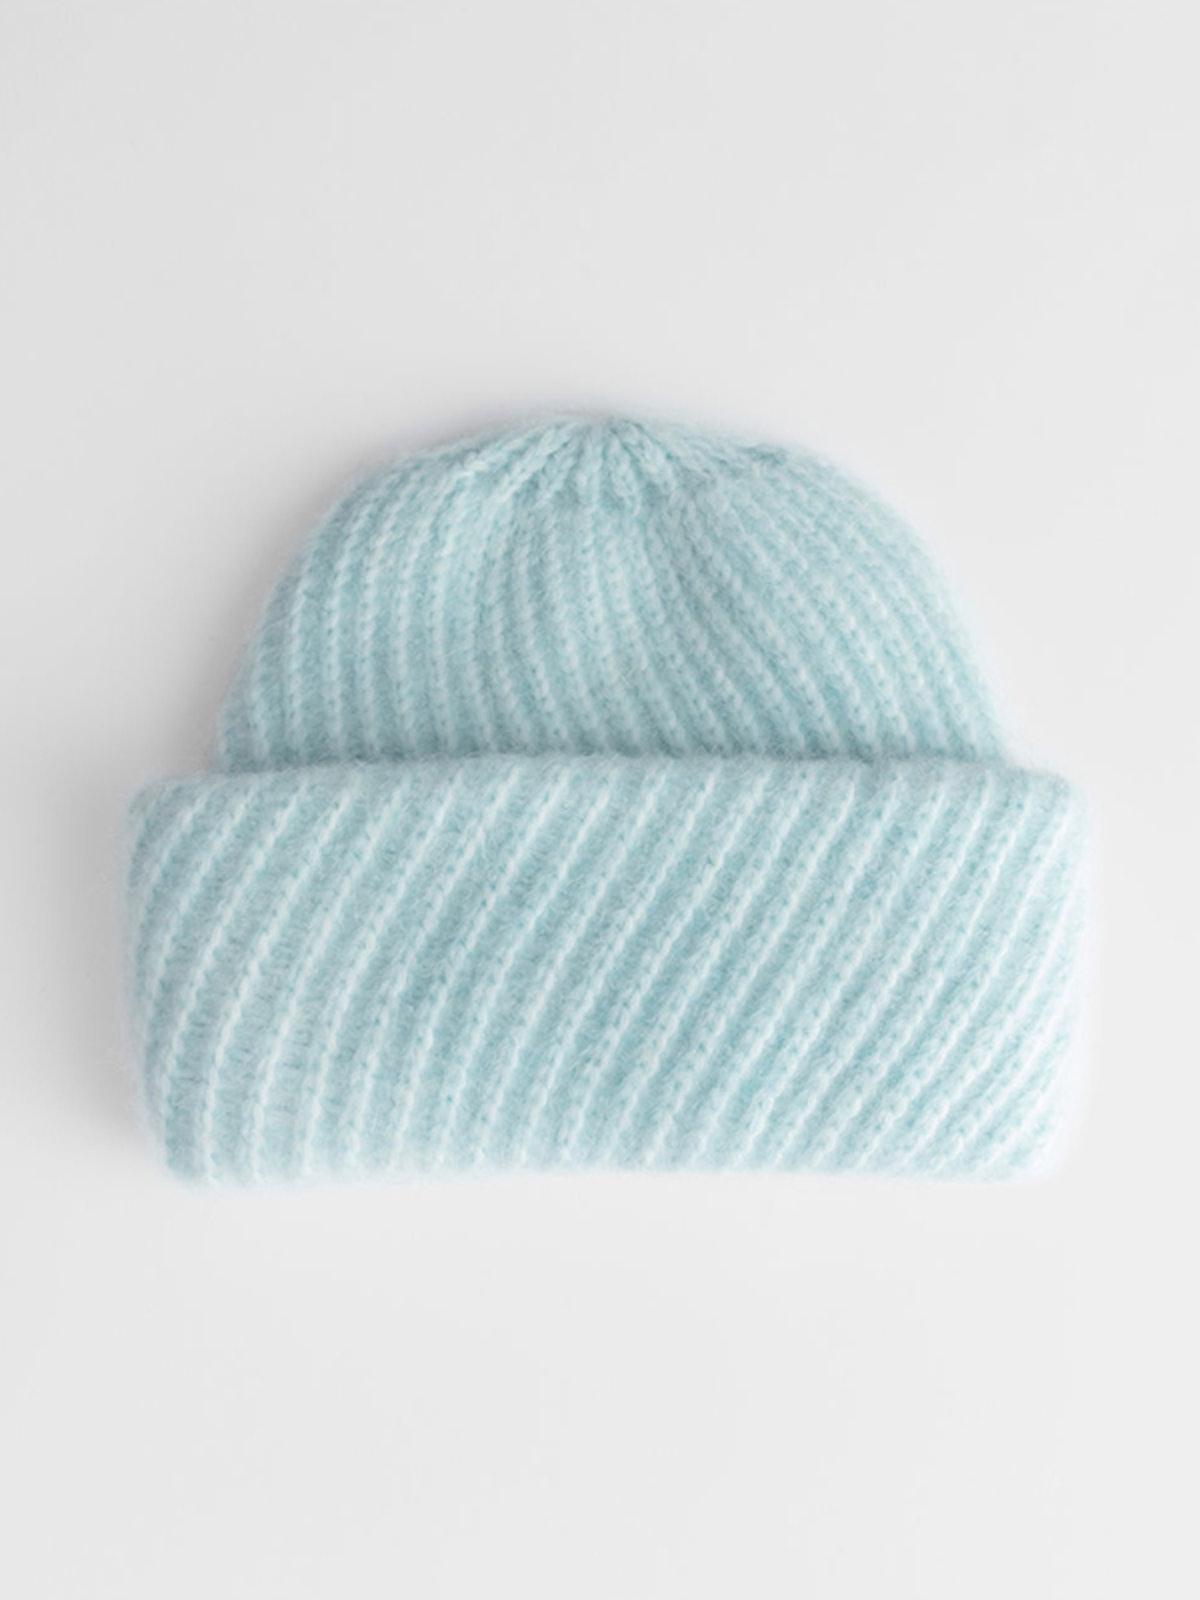 Diagonal Wool Blend Knit Beanie